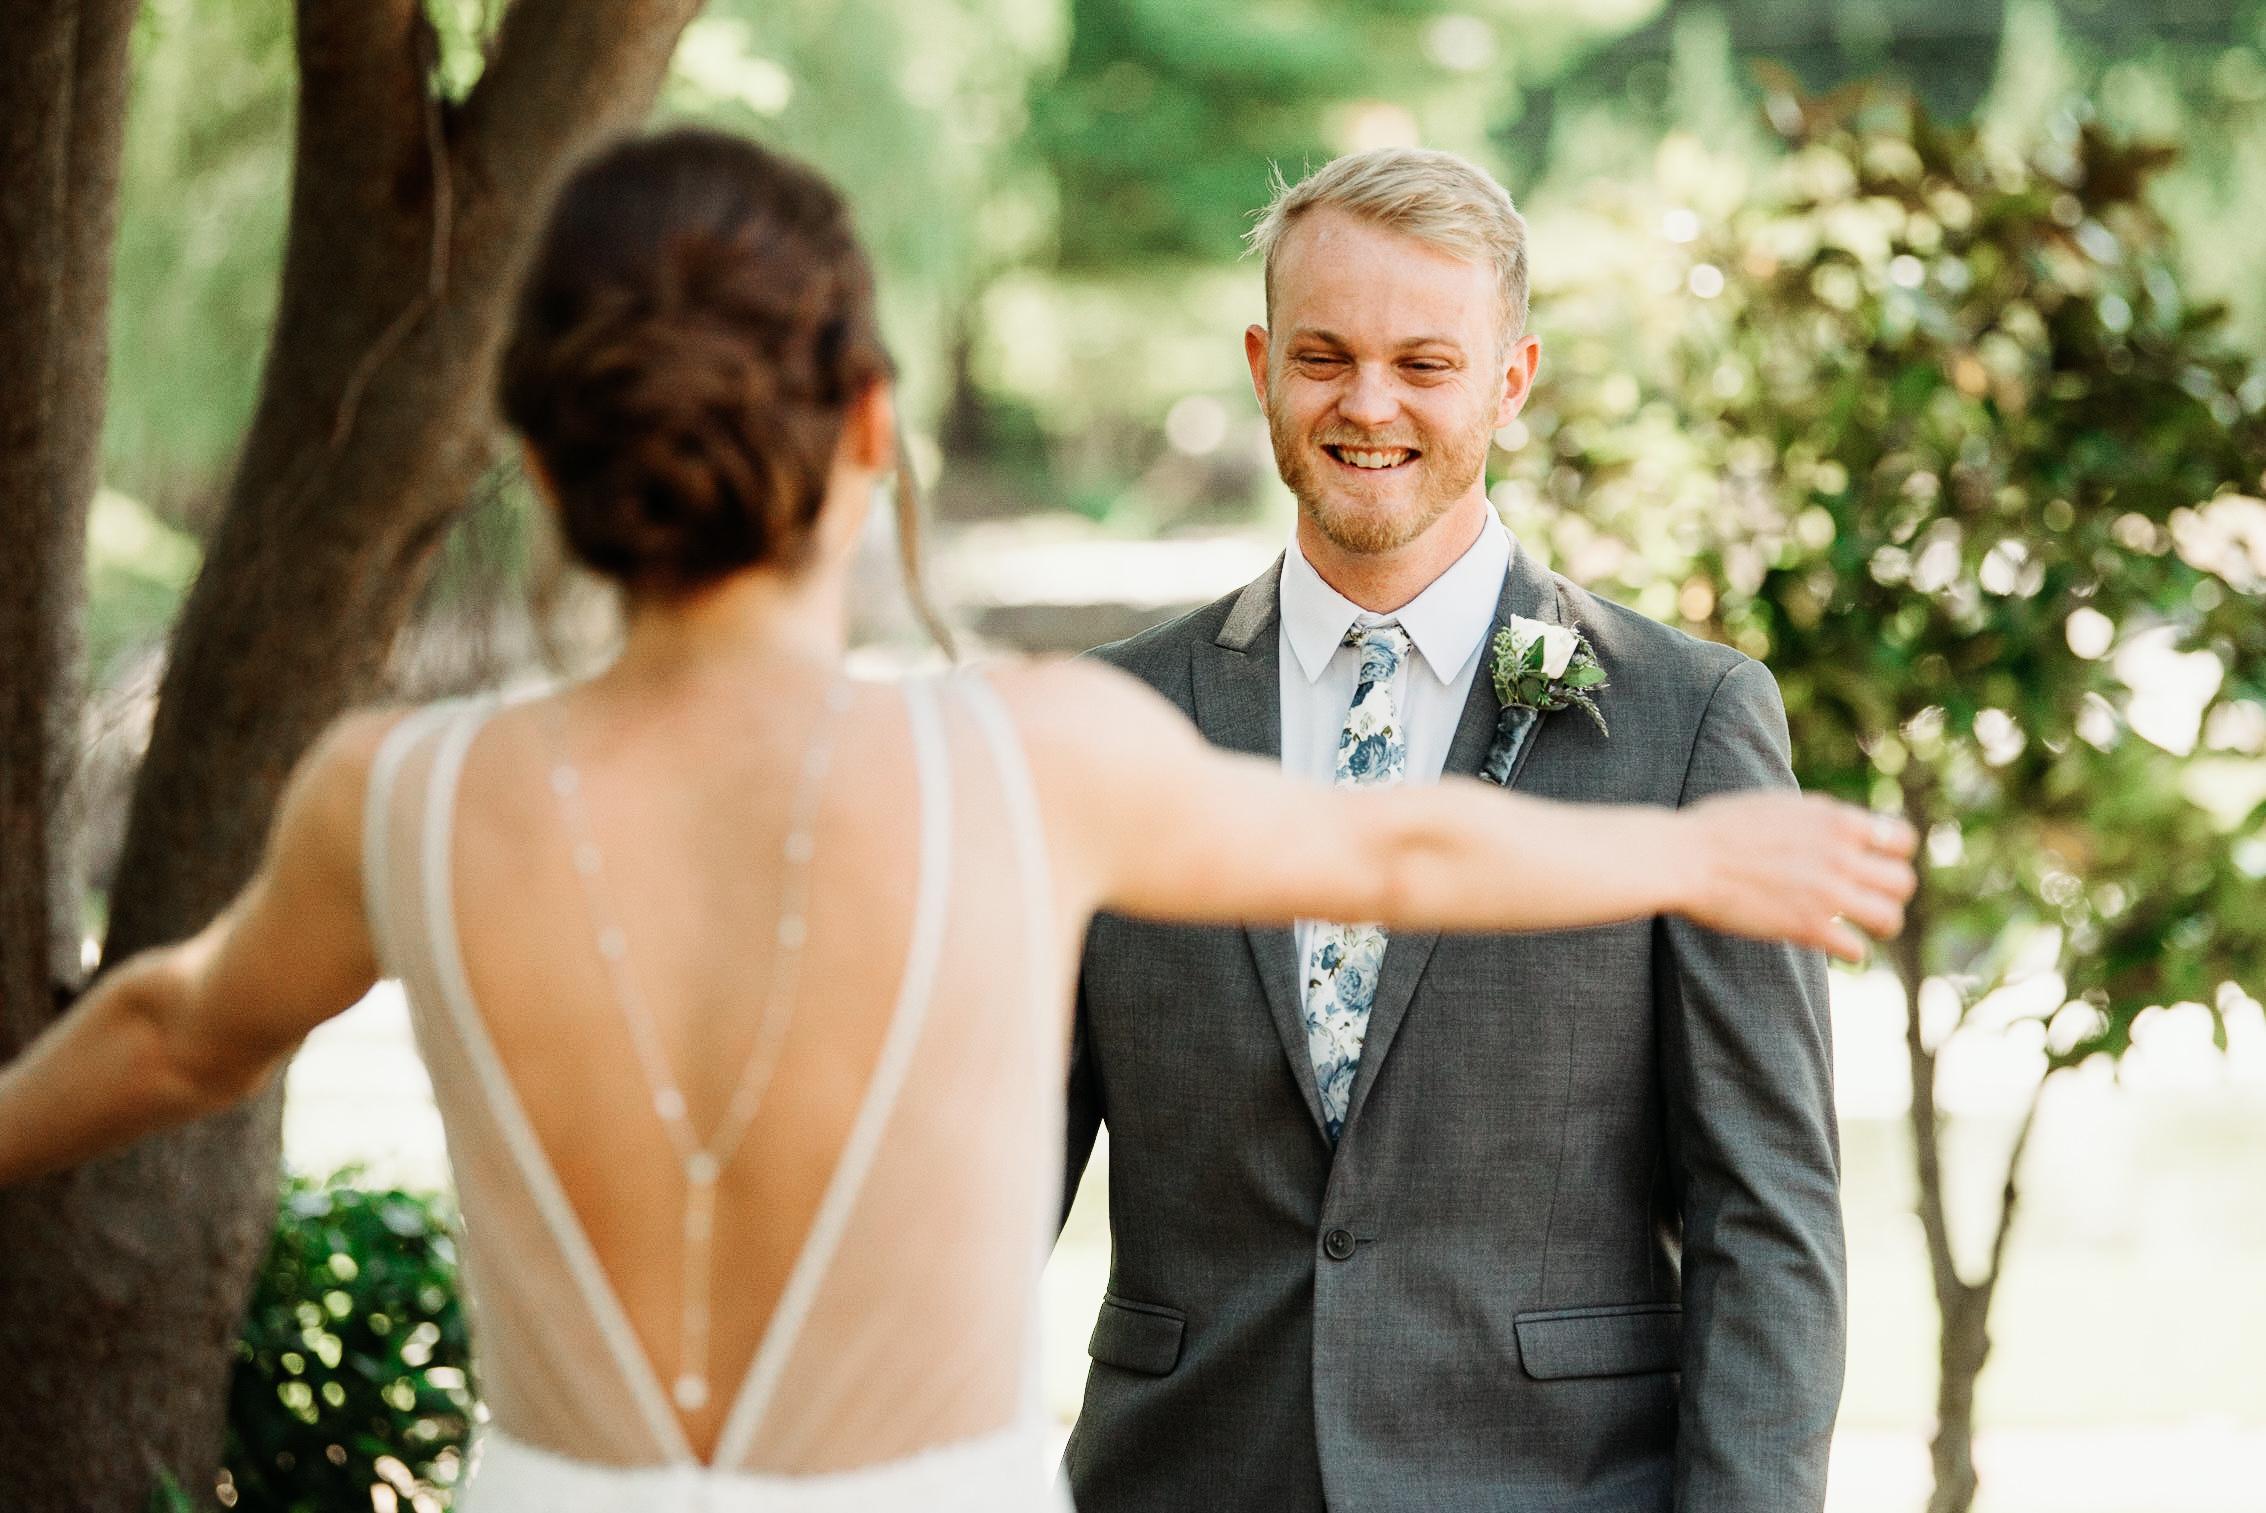 okc-wedding-photographer-coles-garden-wedding-okc-best-wedding-photographers-40.jpg